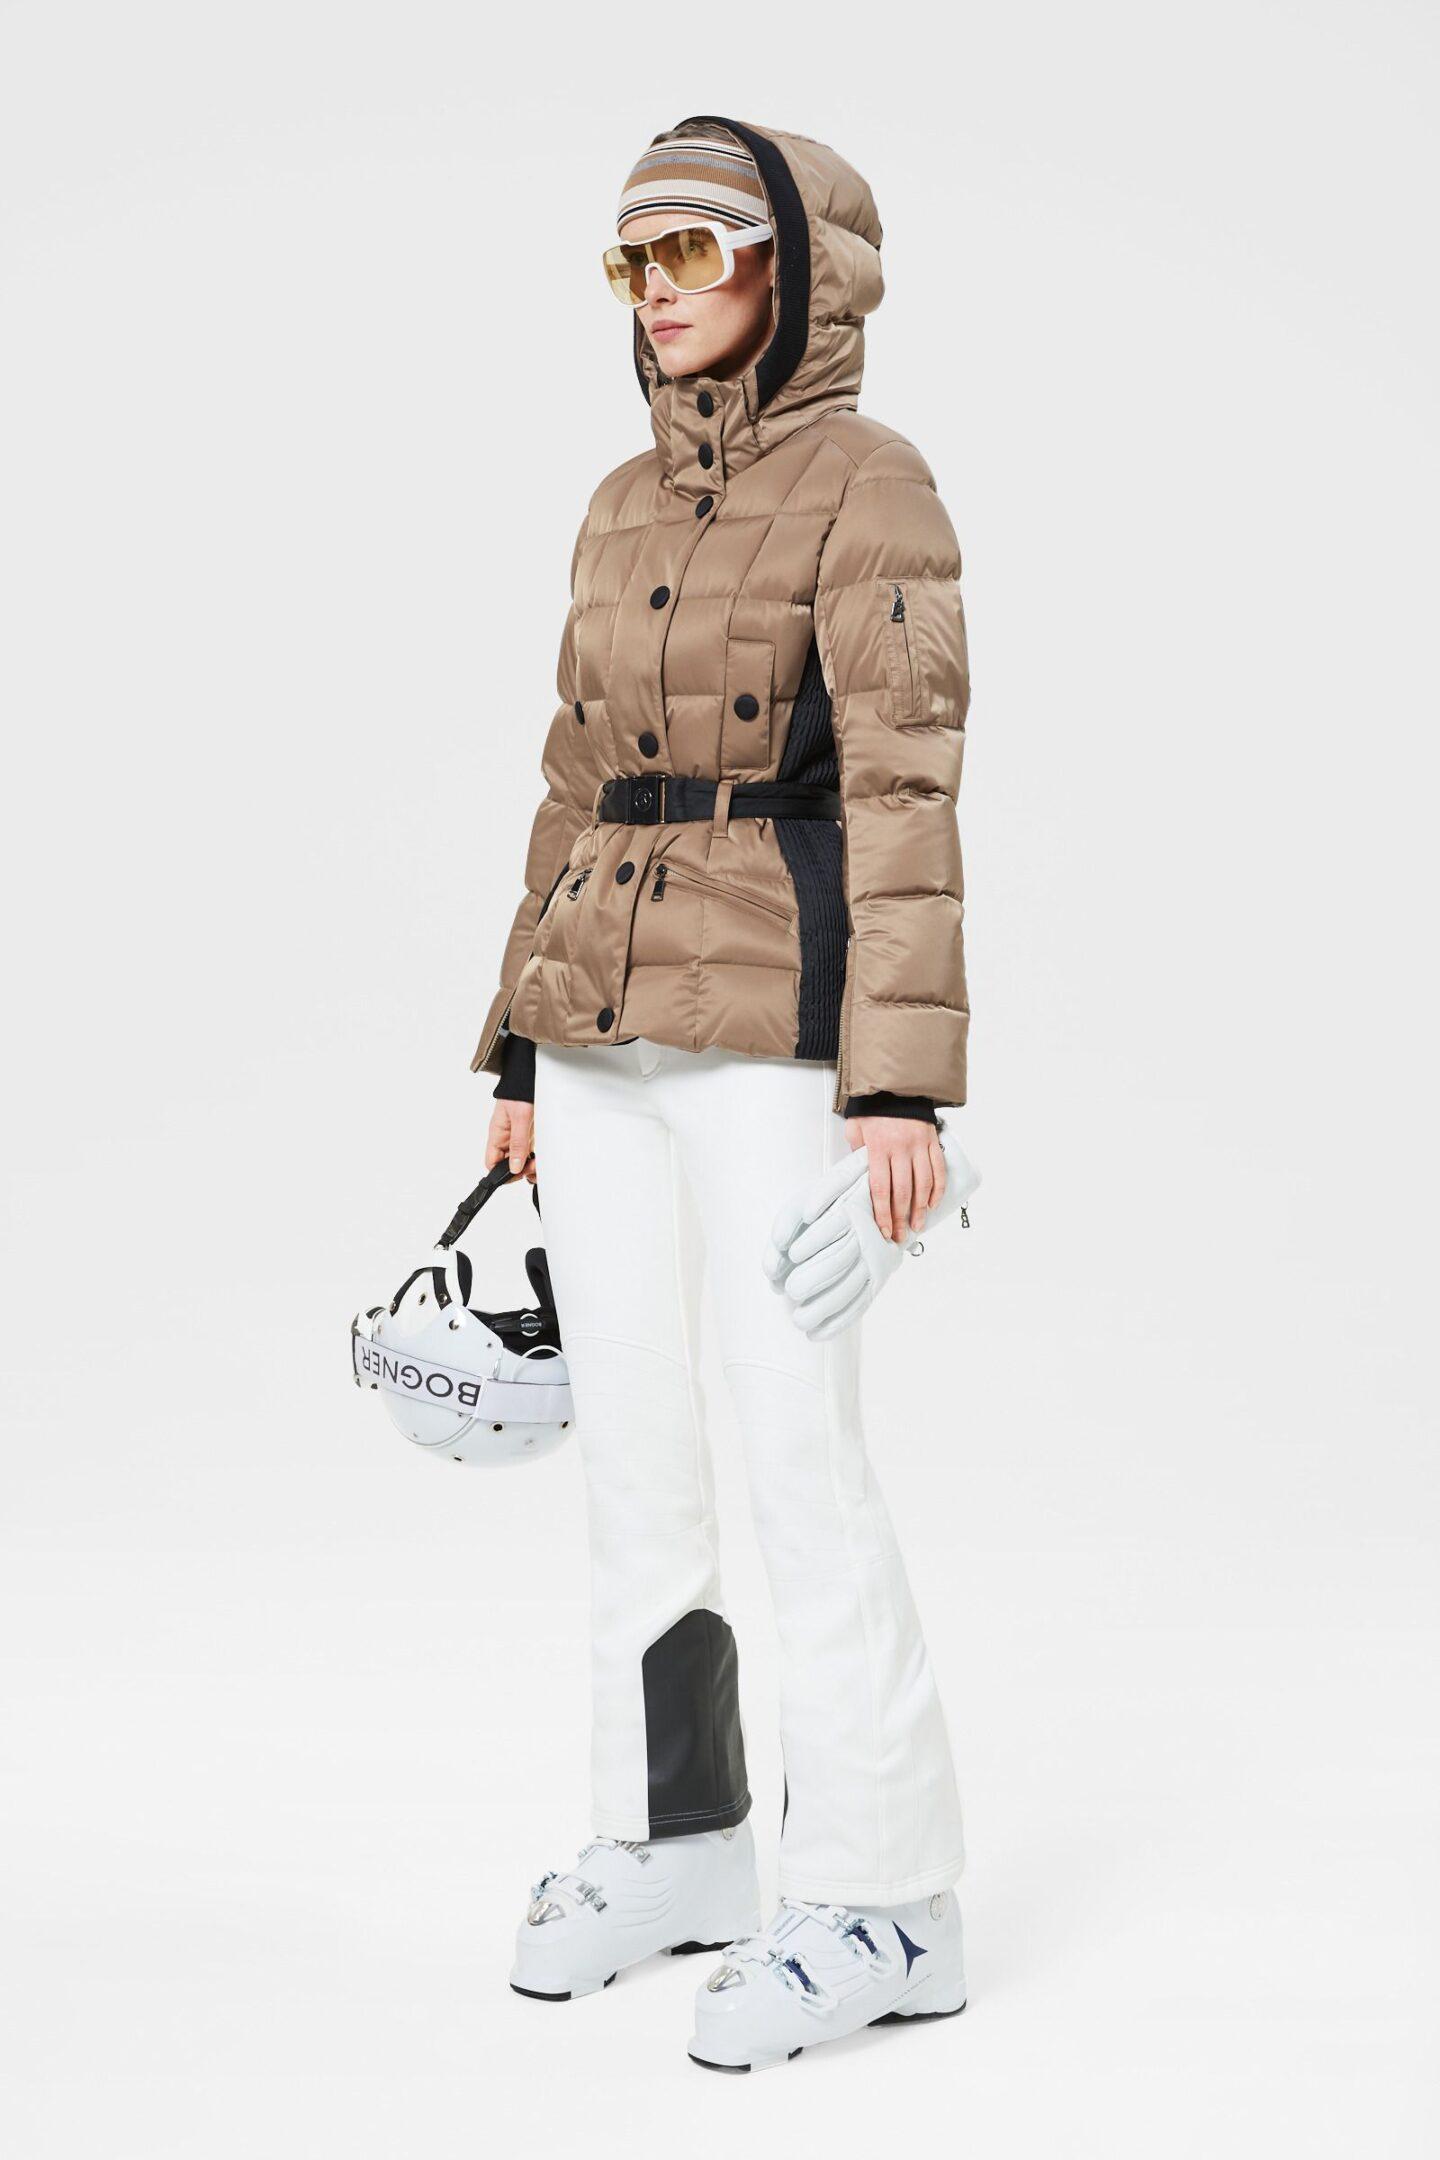 gisa outfit_MO_b2c_1605616804